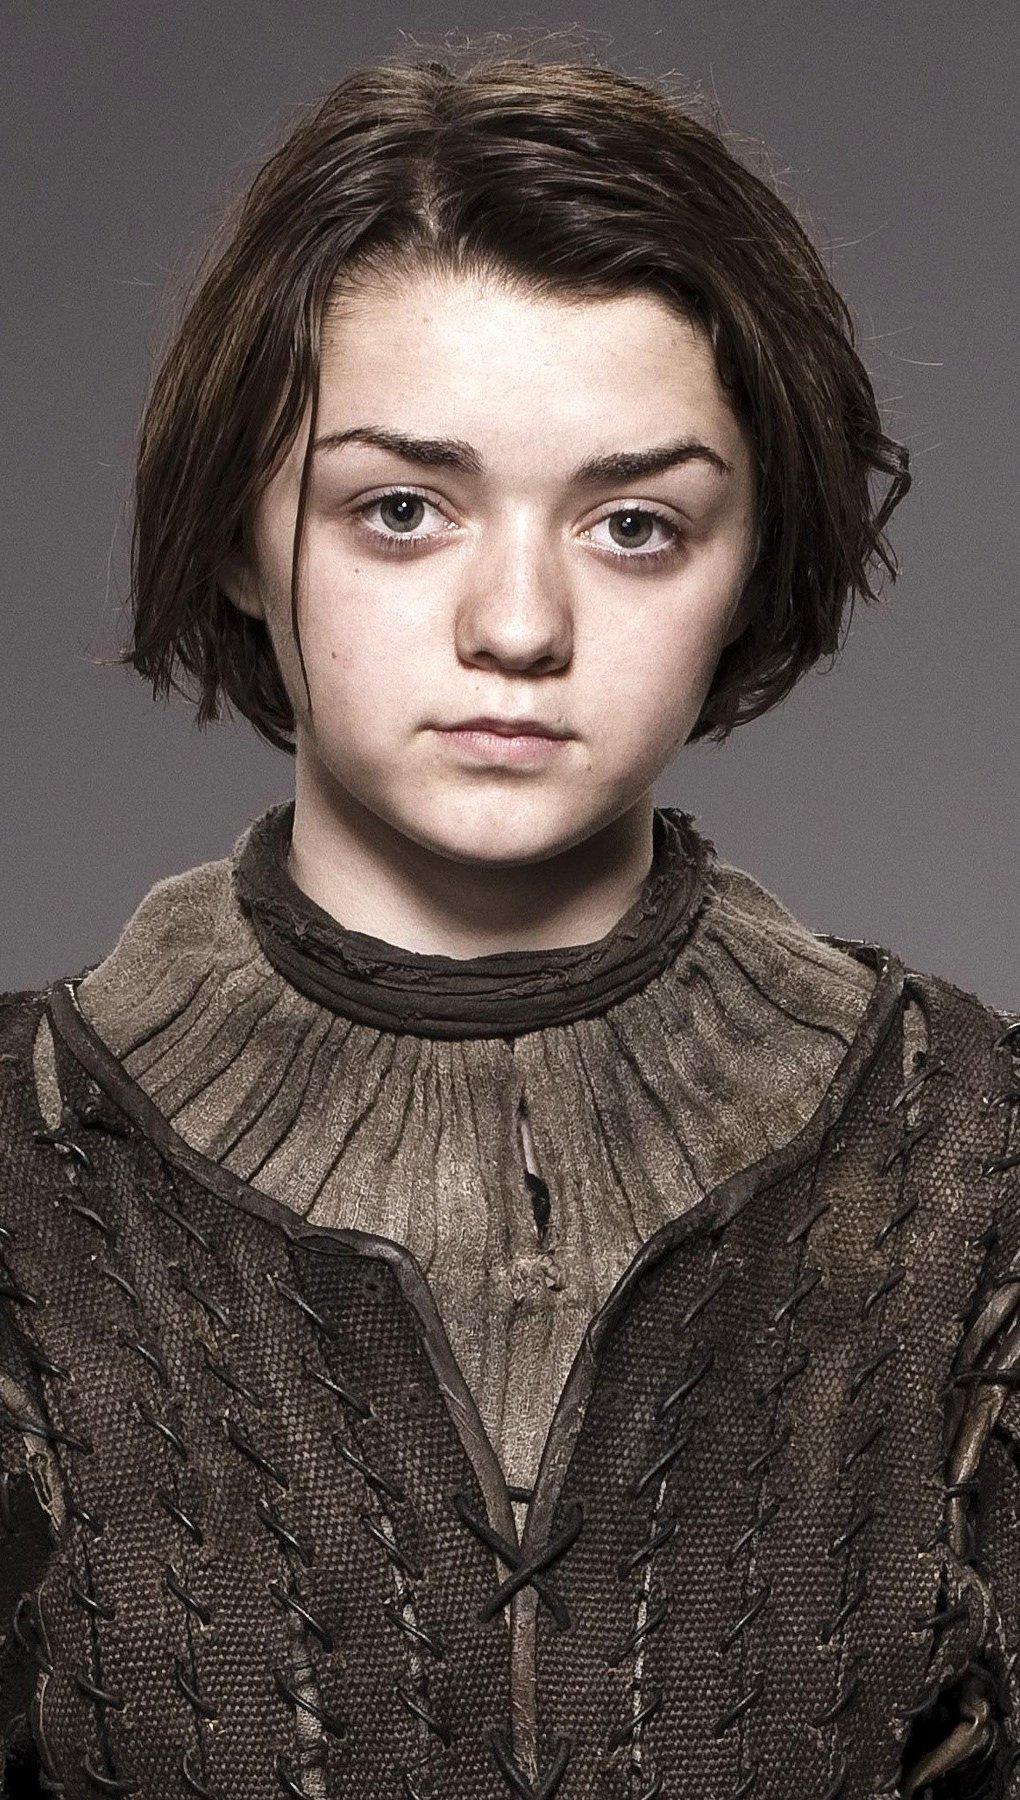 Wallpaper Arya Stark from Game Of Thrones Vertical